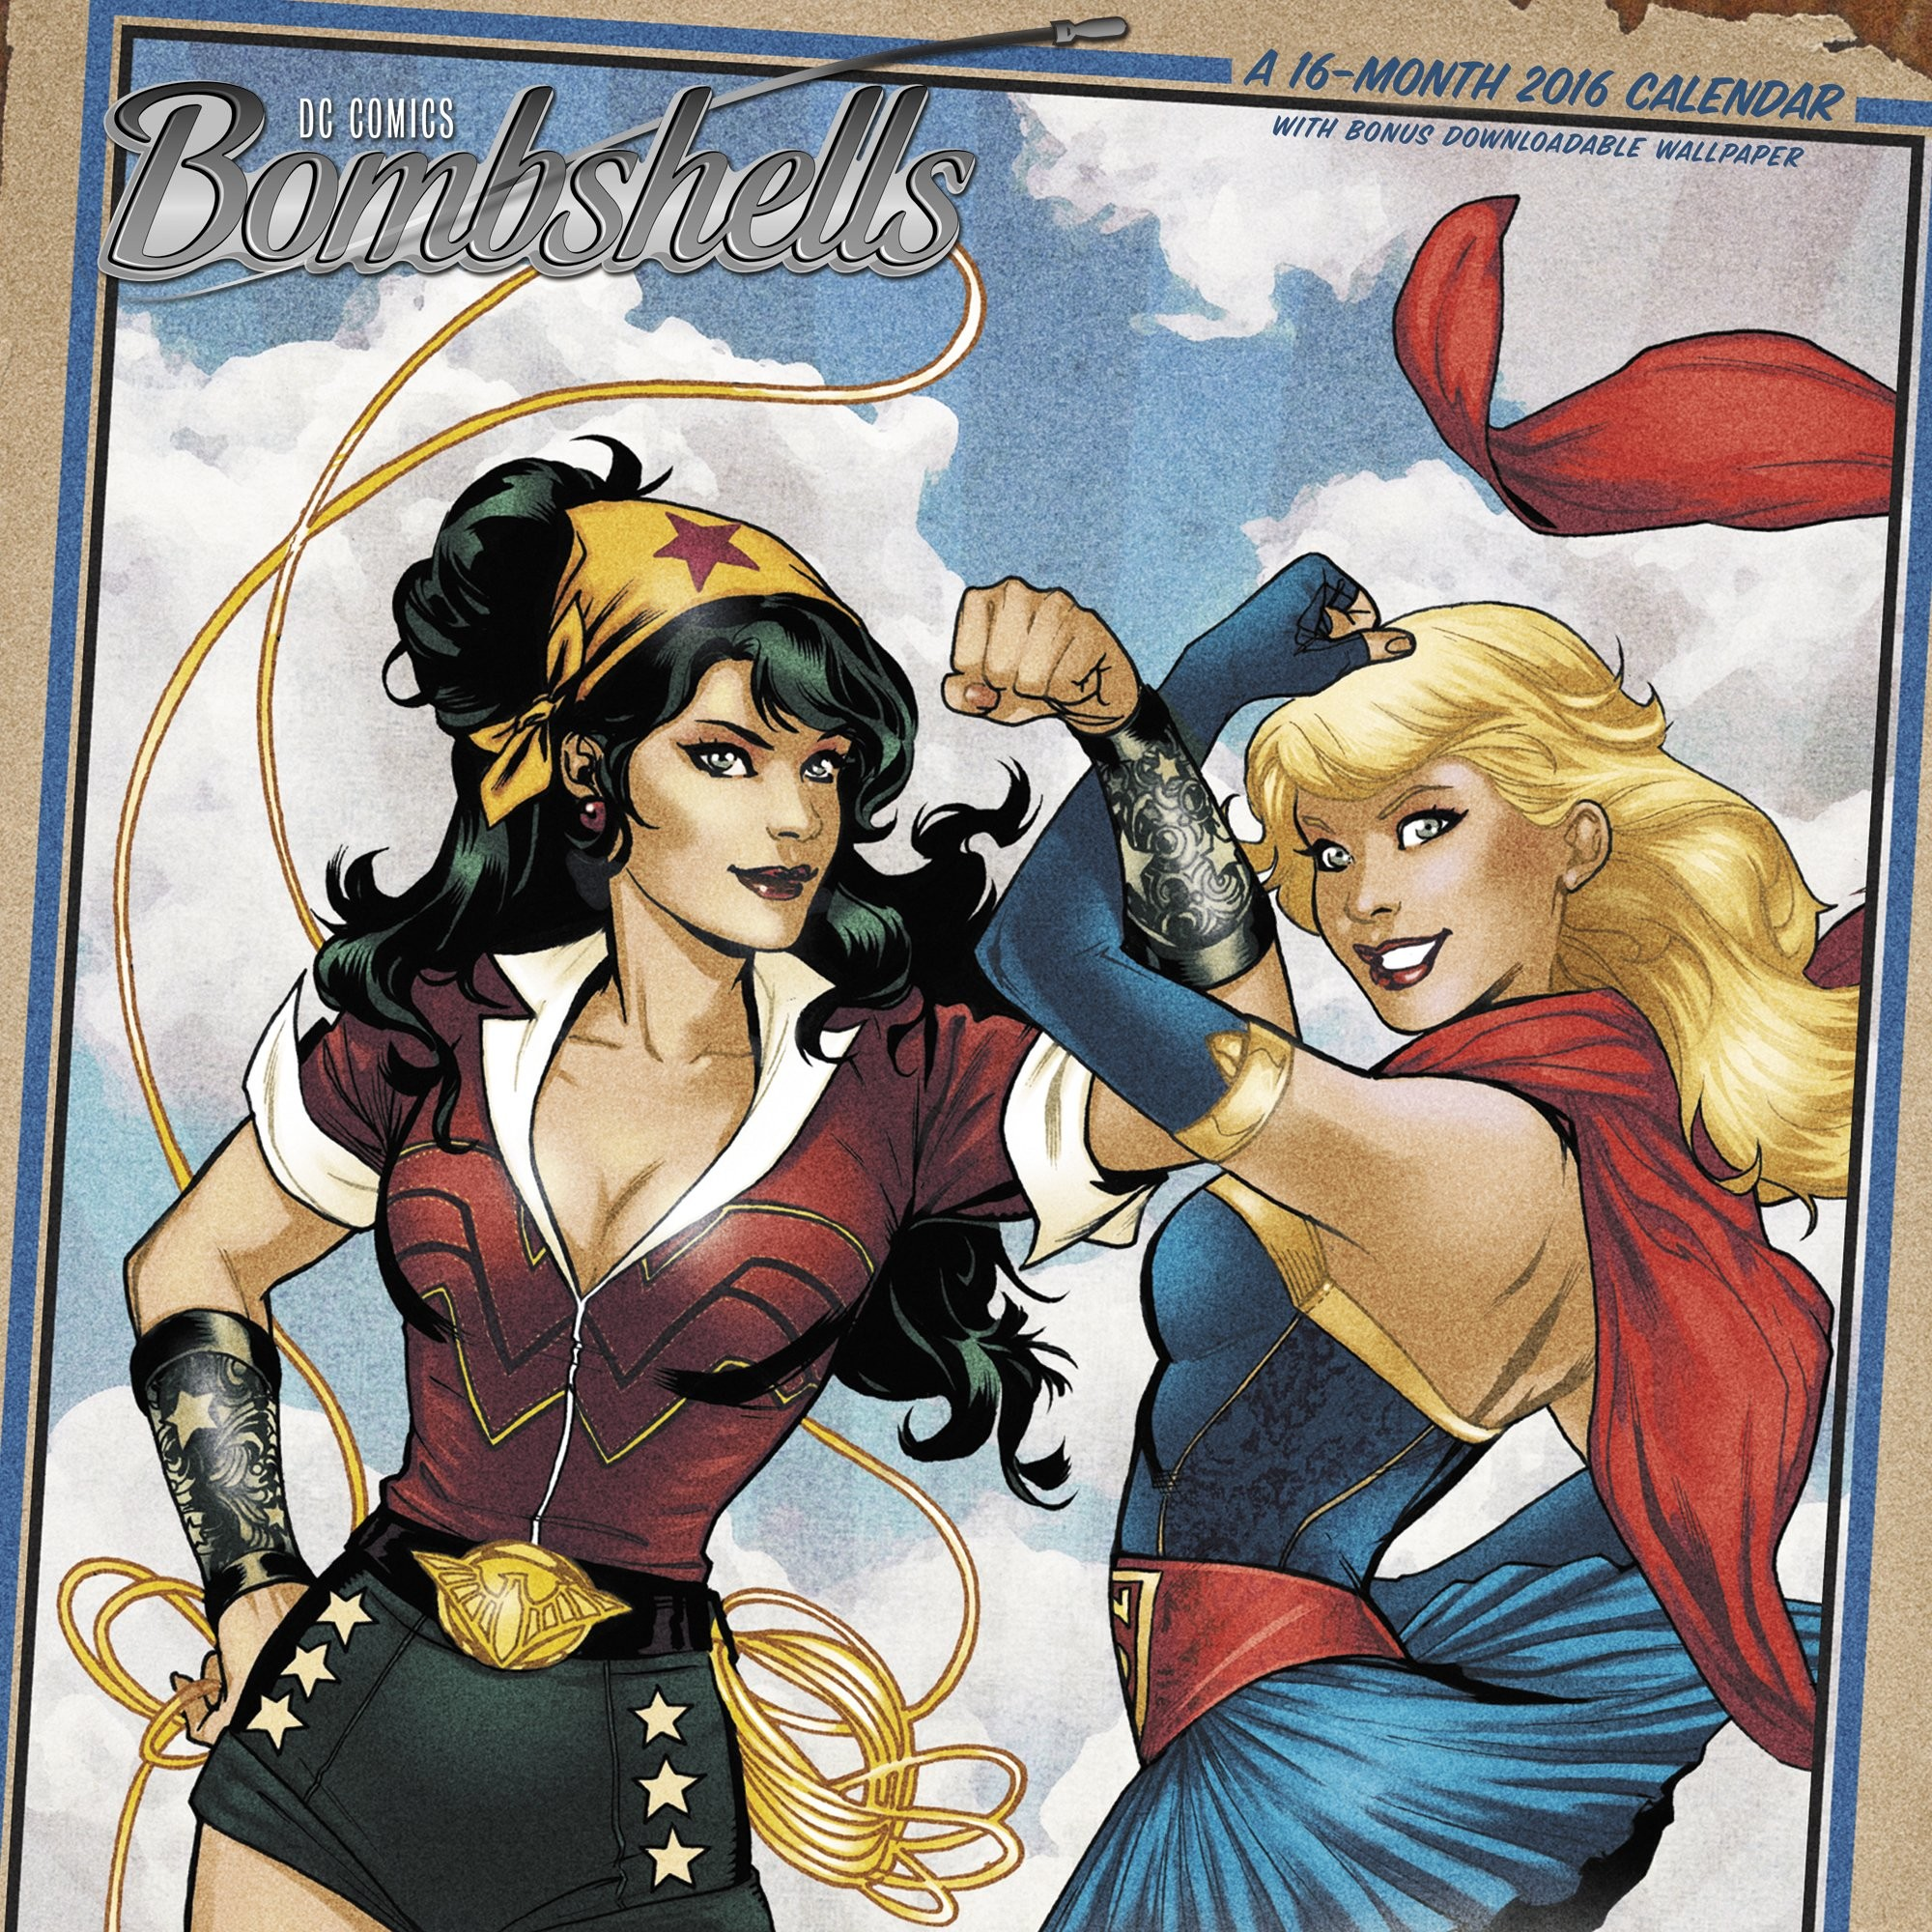 DC Bombshells 2016 Calendar: With Bonus Downloadable Wallpaper:  Amazon.co.uk: ACCO Brands: 9781629053288: Books